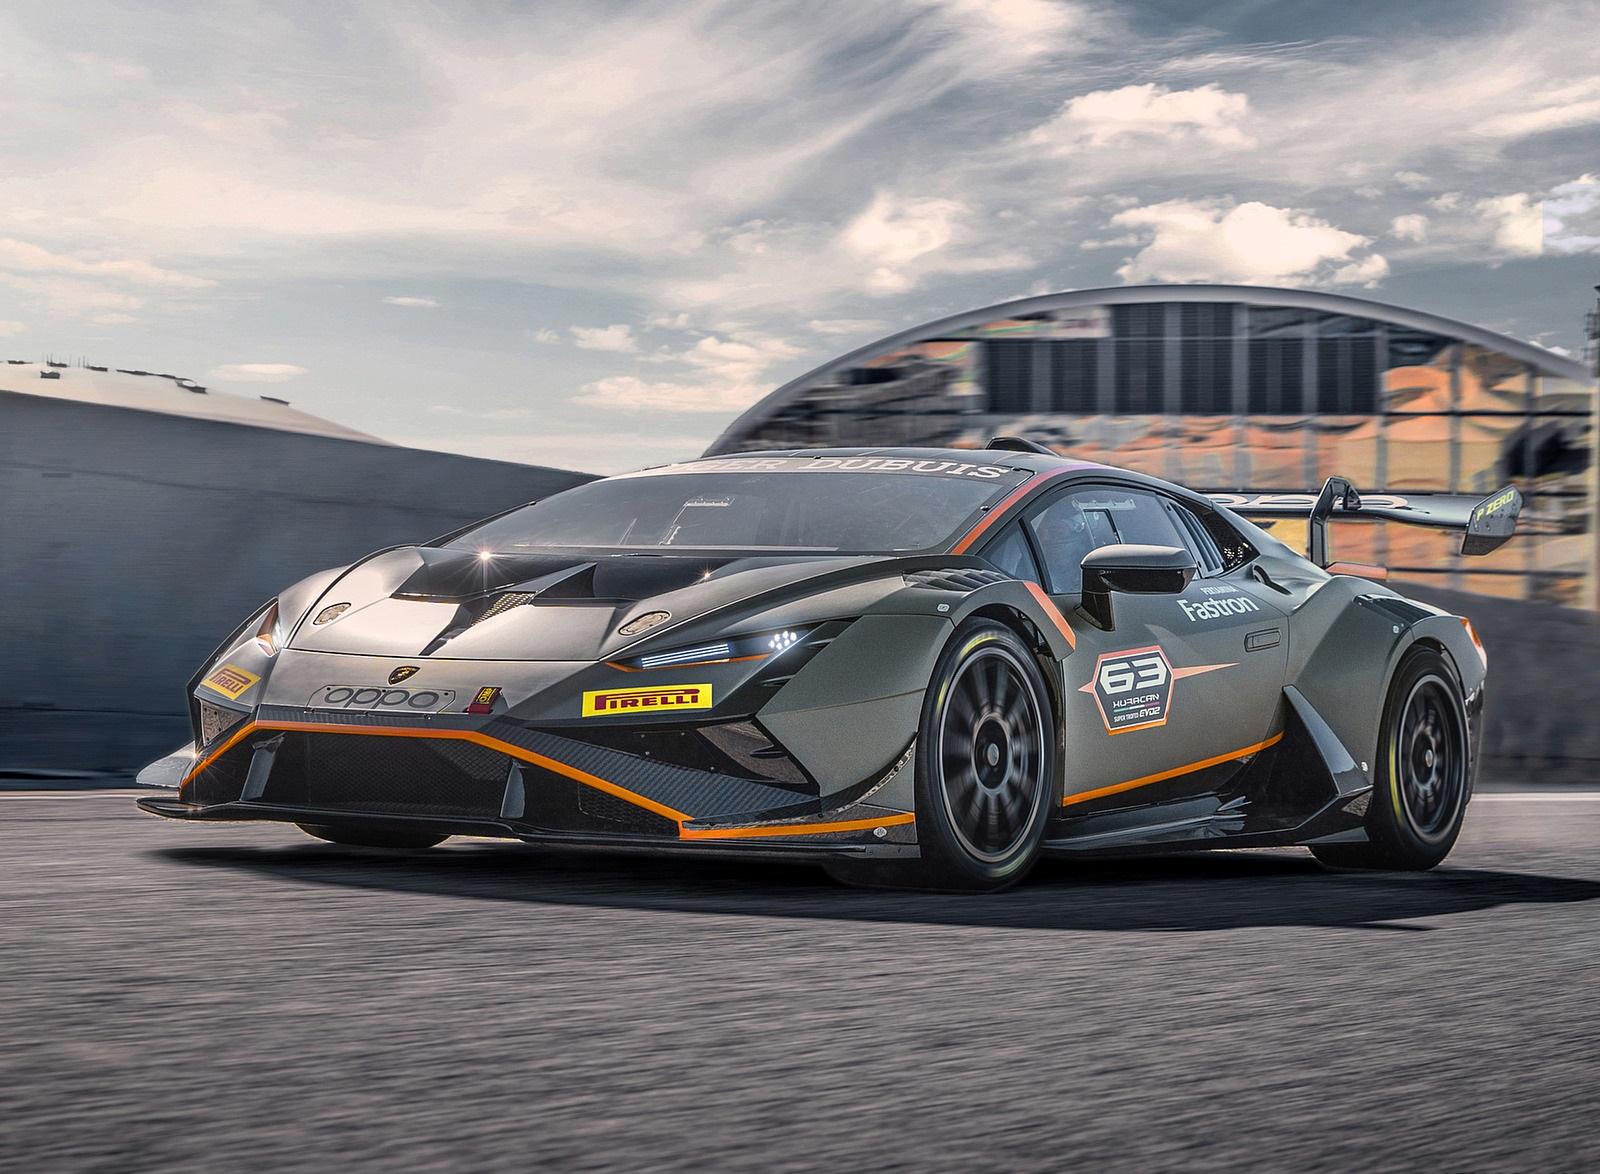 2022 Lamborghini Huracán Super Trofeo EVO2 Front Three-Quarter Wallpapers (1)